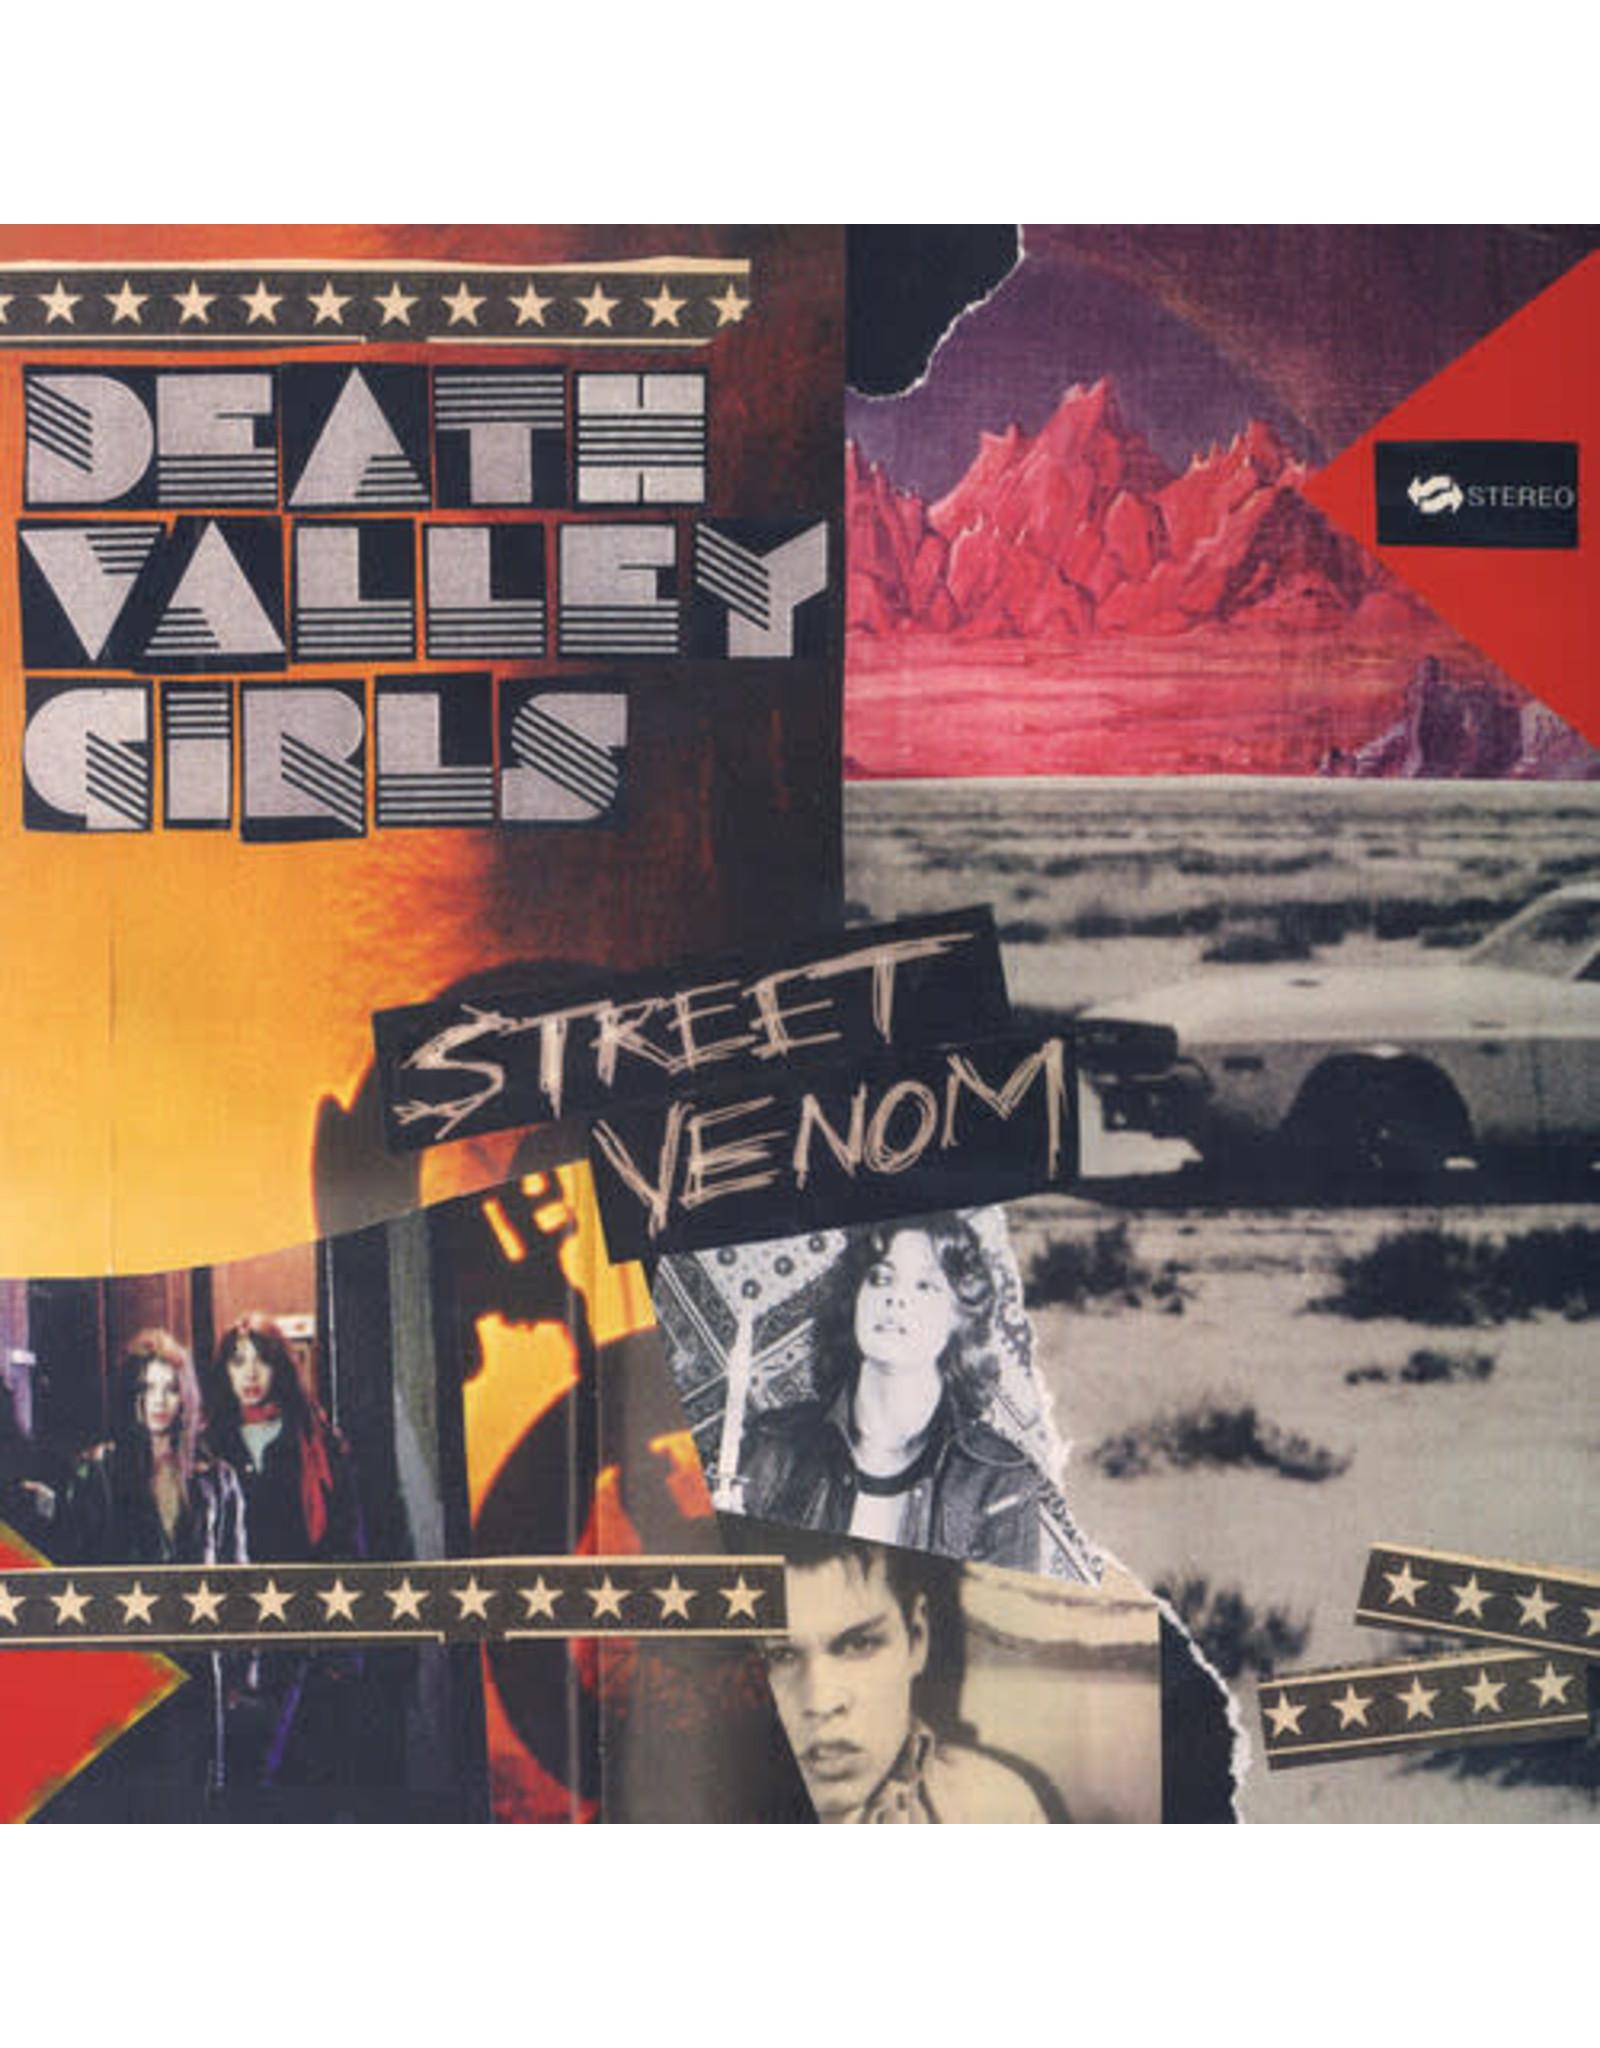 Death Valley Girls / Street Venom (Satan's Fingerprint Colored Vinyl)